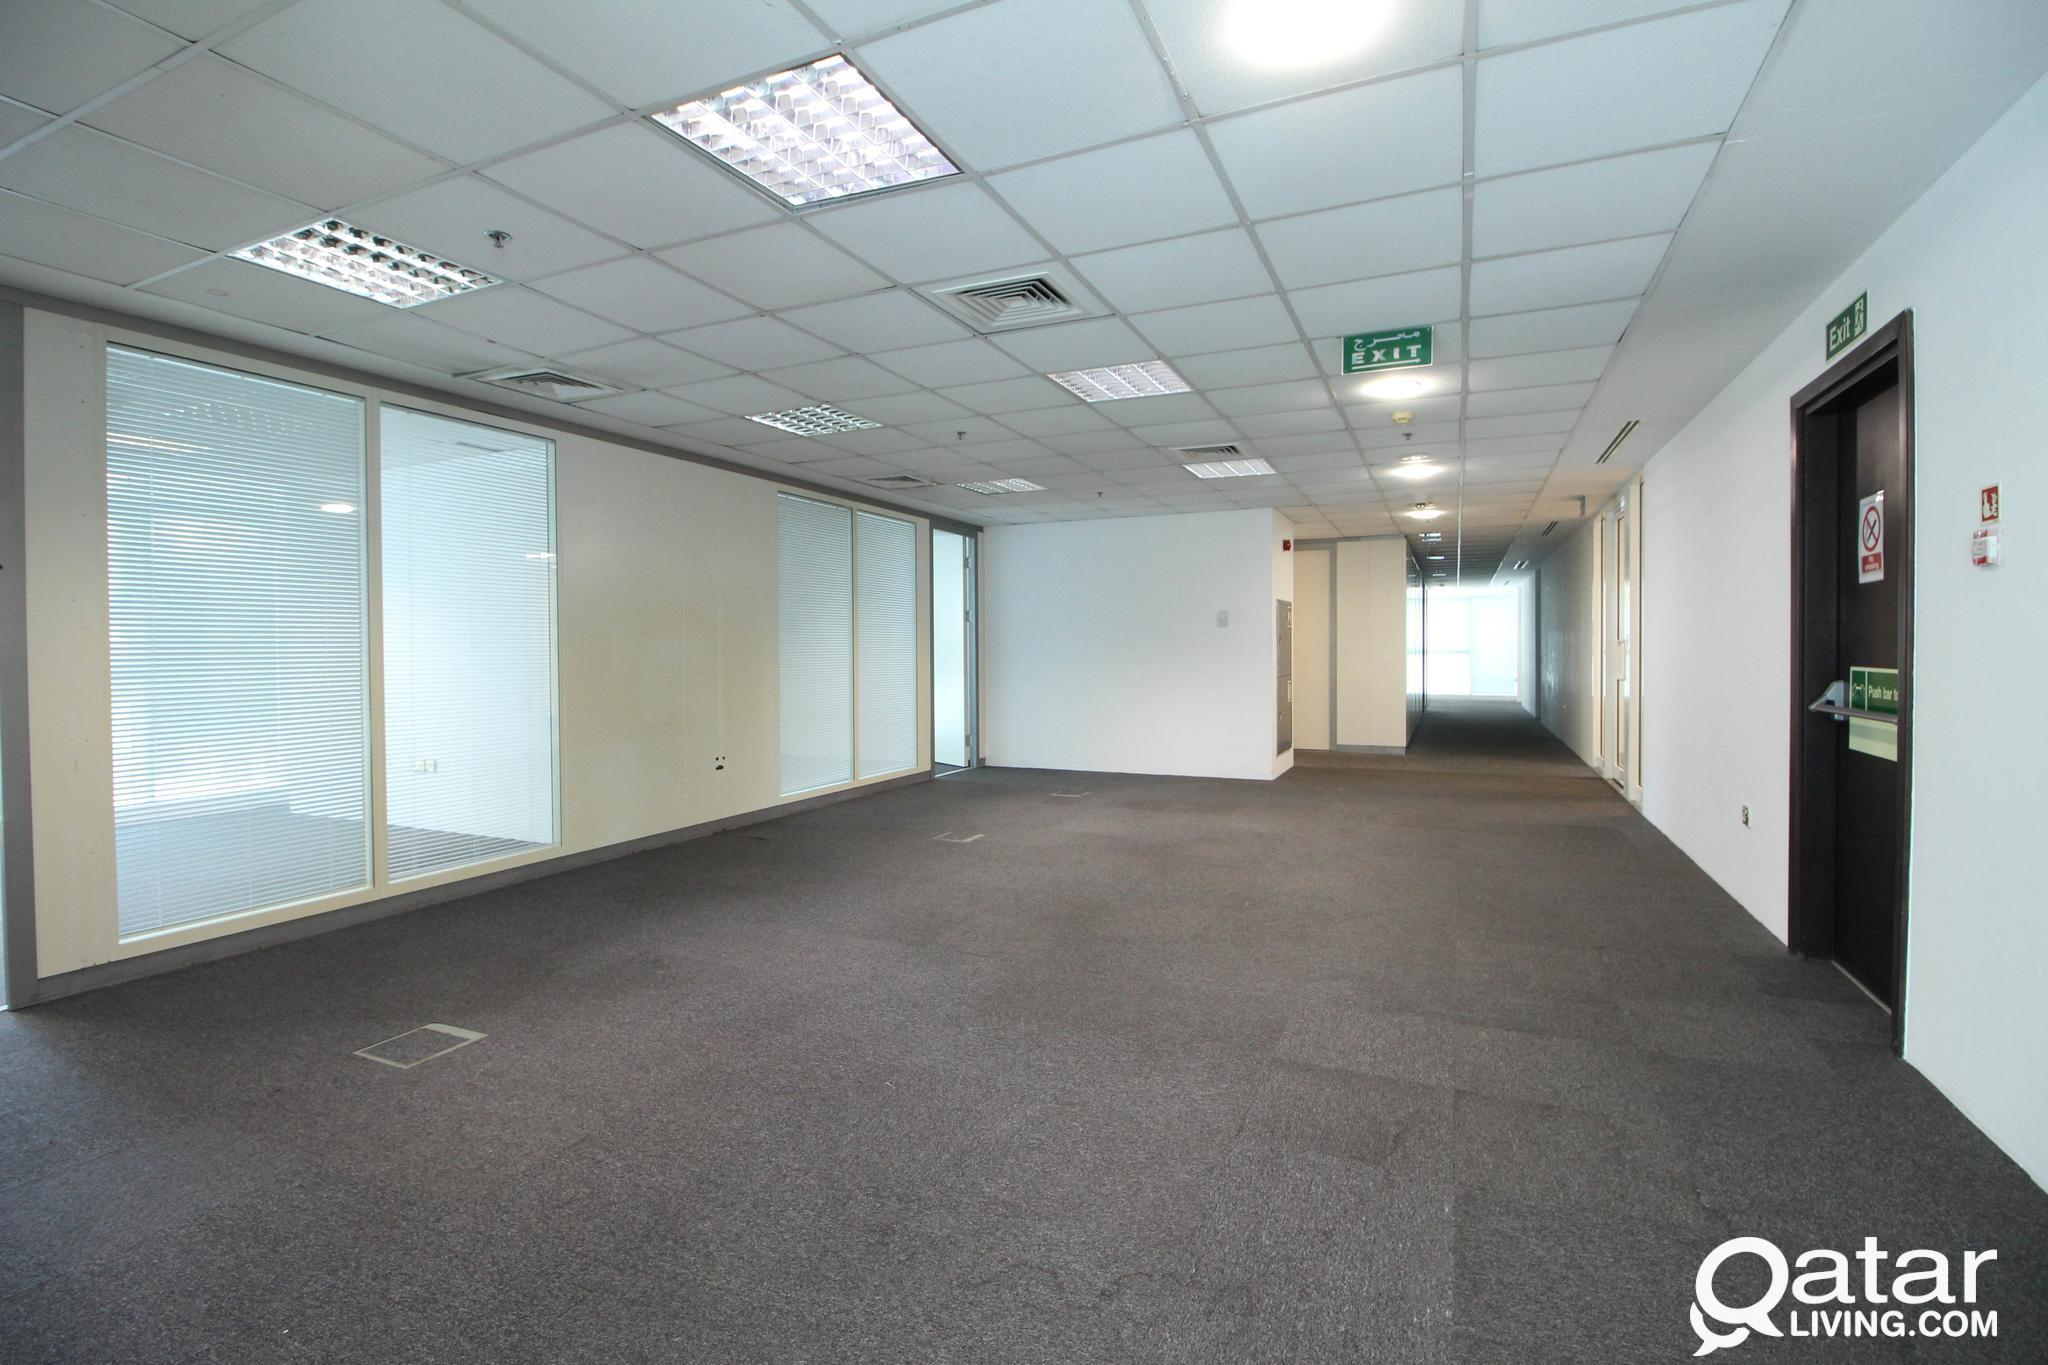 150 Sqm,375 Sqm and 750 Sqm Full and Quarter Floor